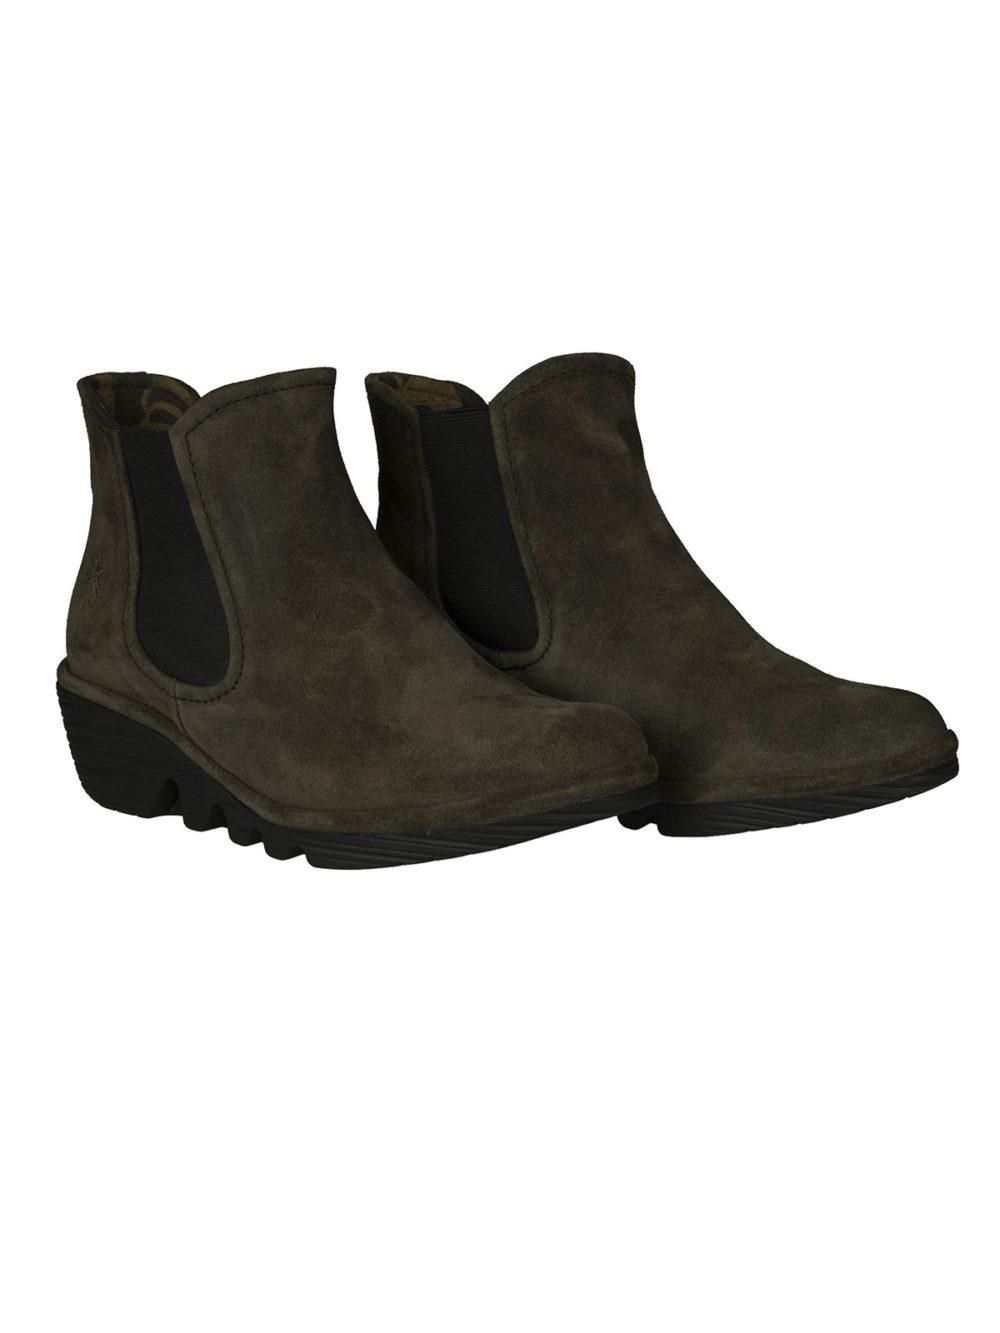 Phil Boot